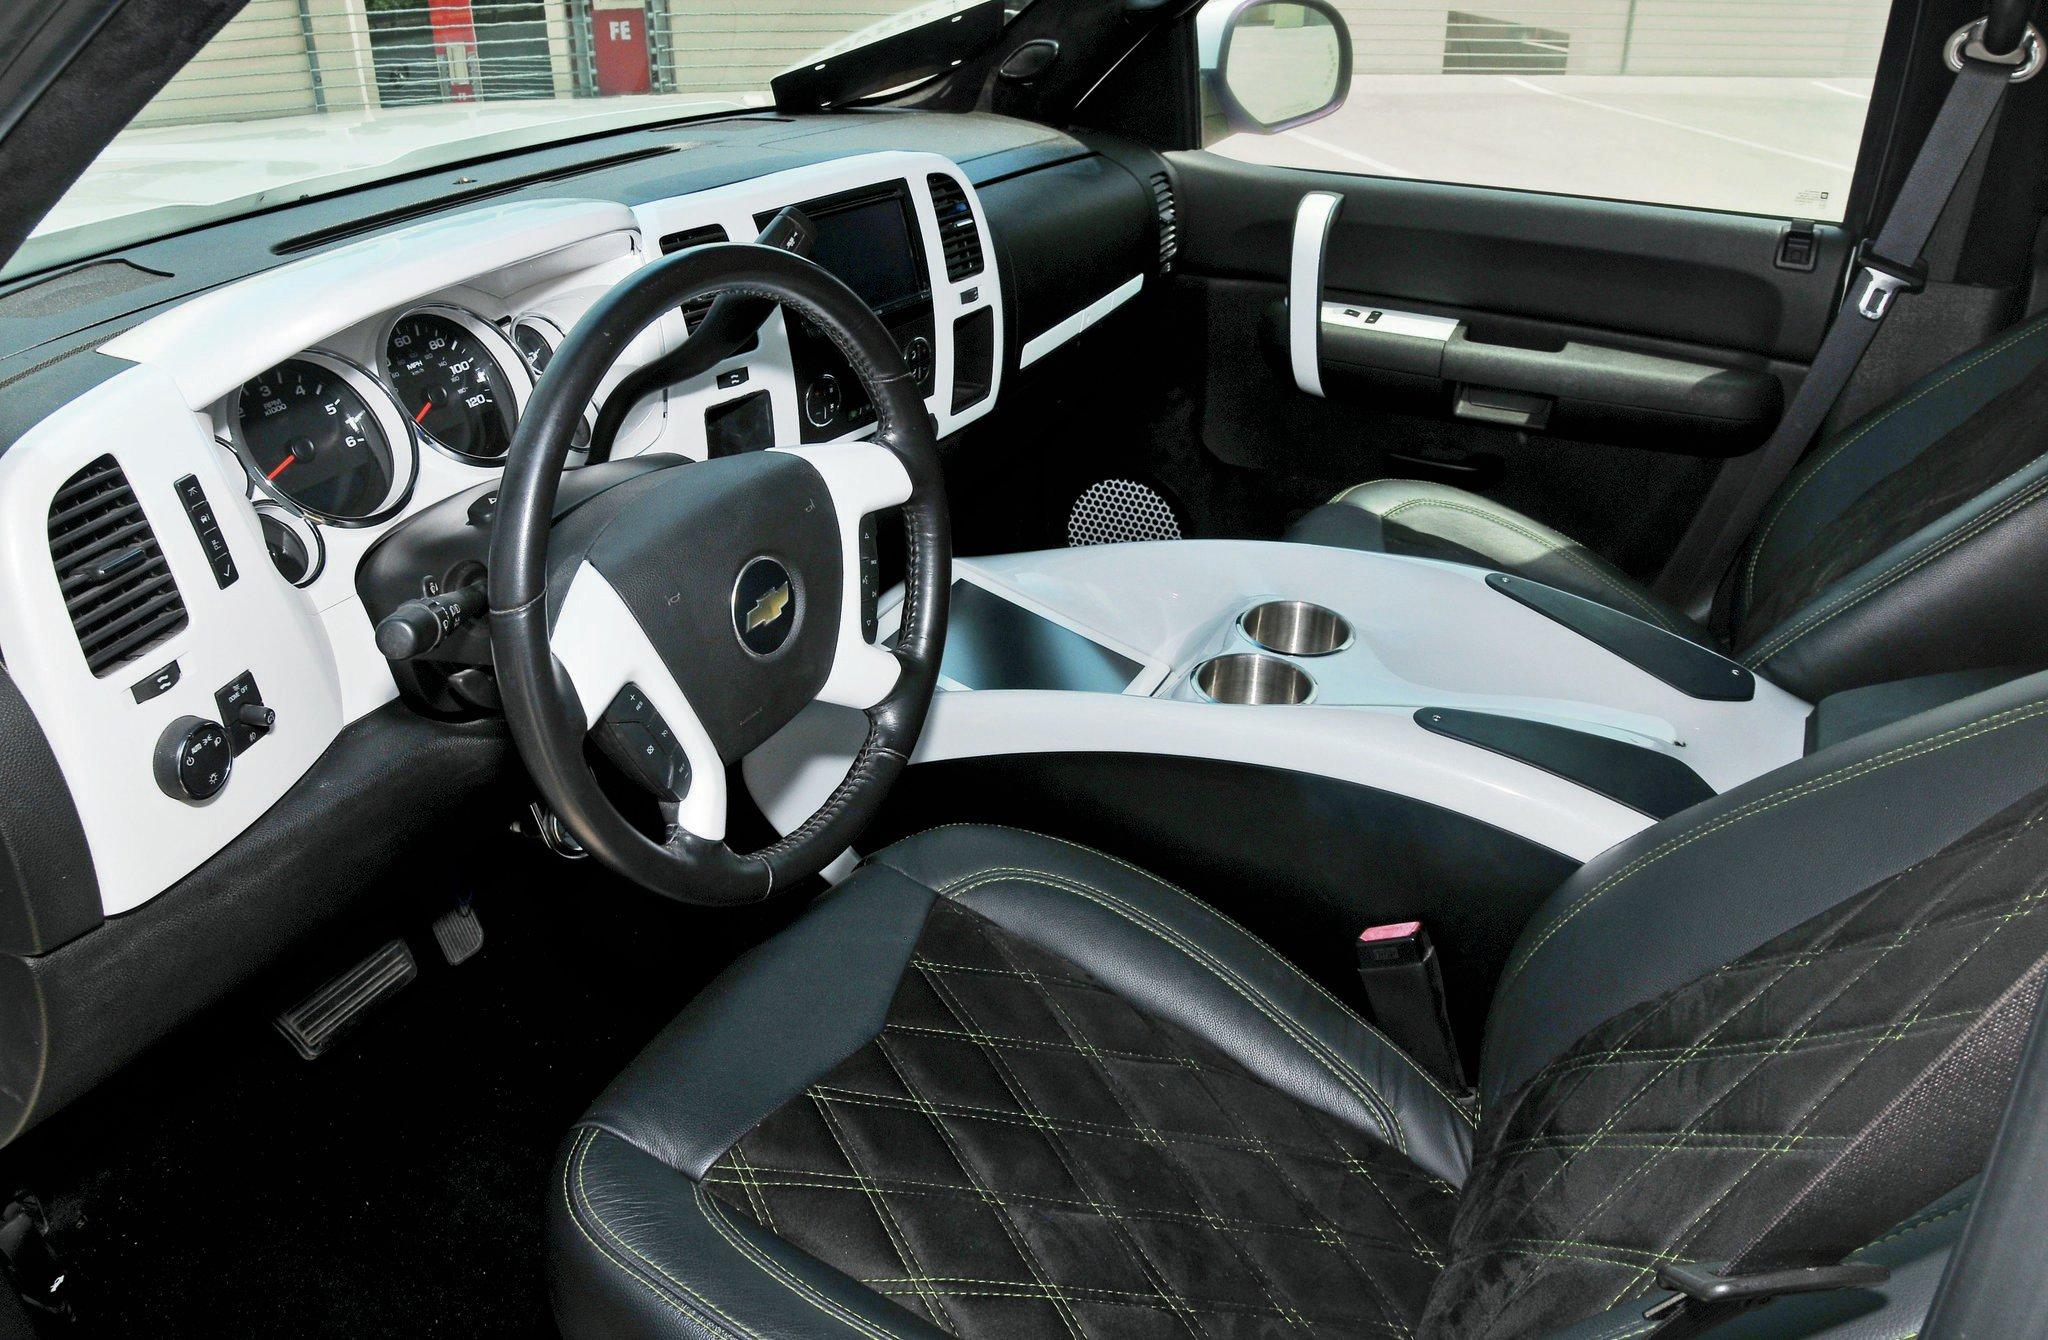 2008 Chevrolet Silverado Dnt H8t